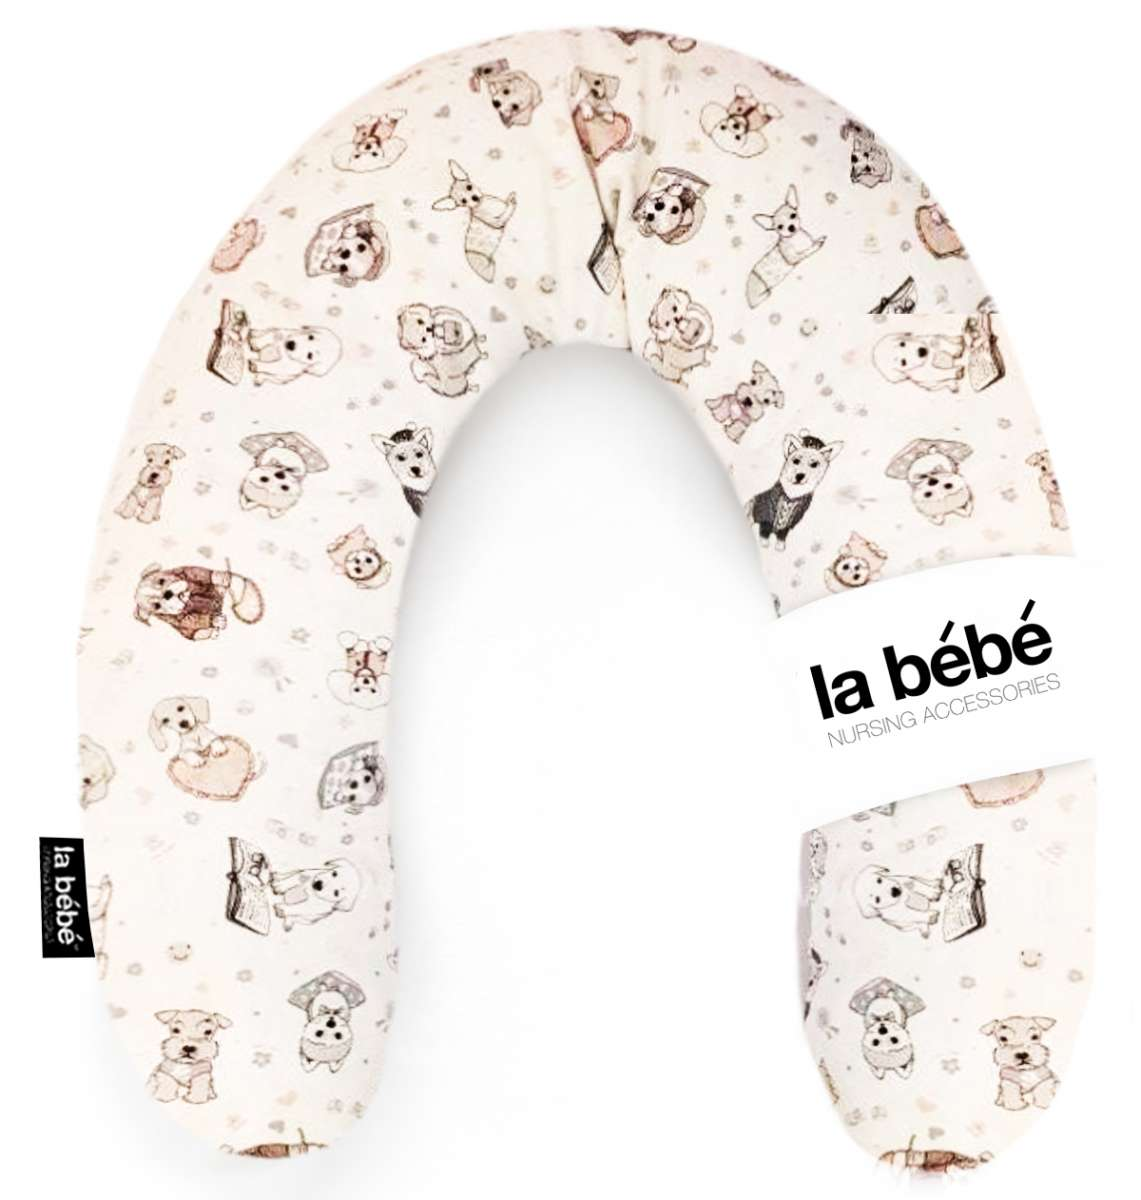 La Bebe Rich Dogs Cotton Nursing Maternity Pillow Pakavs mazuļa barošanai, gulēšanai 30x175 cm